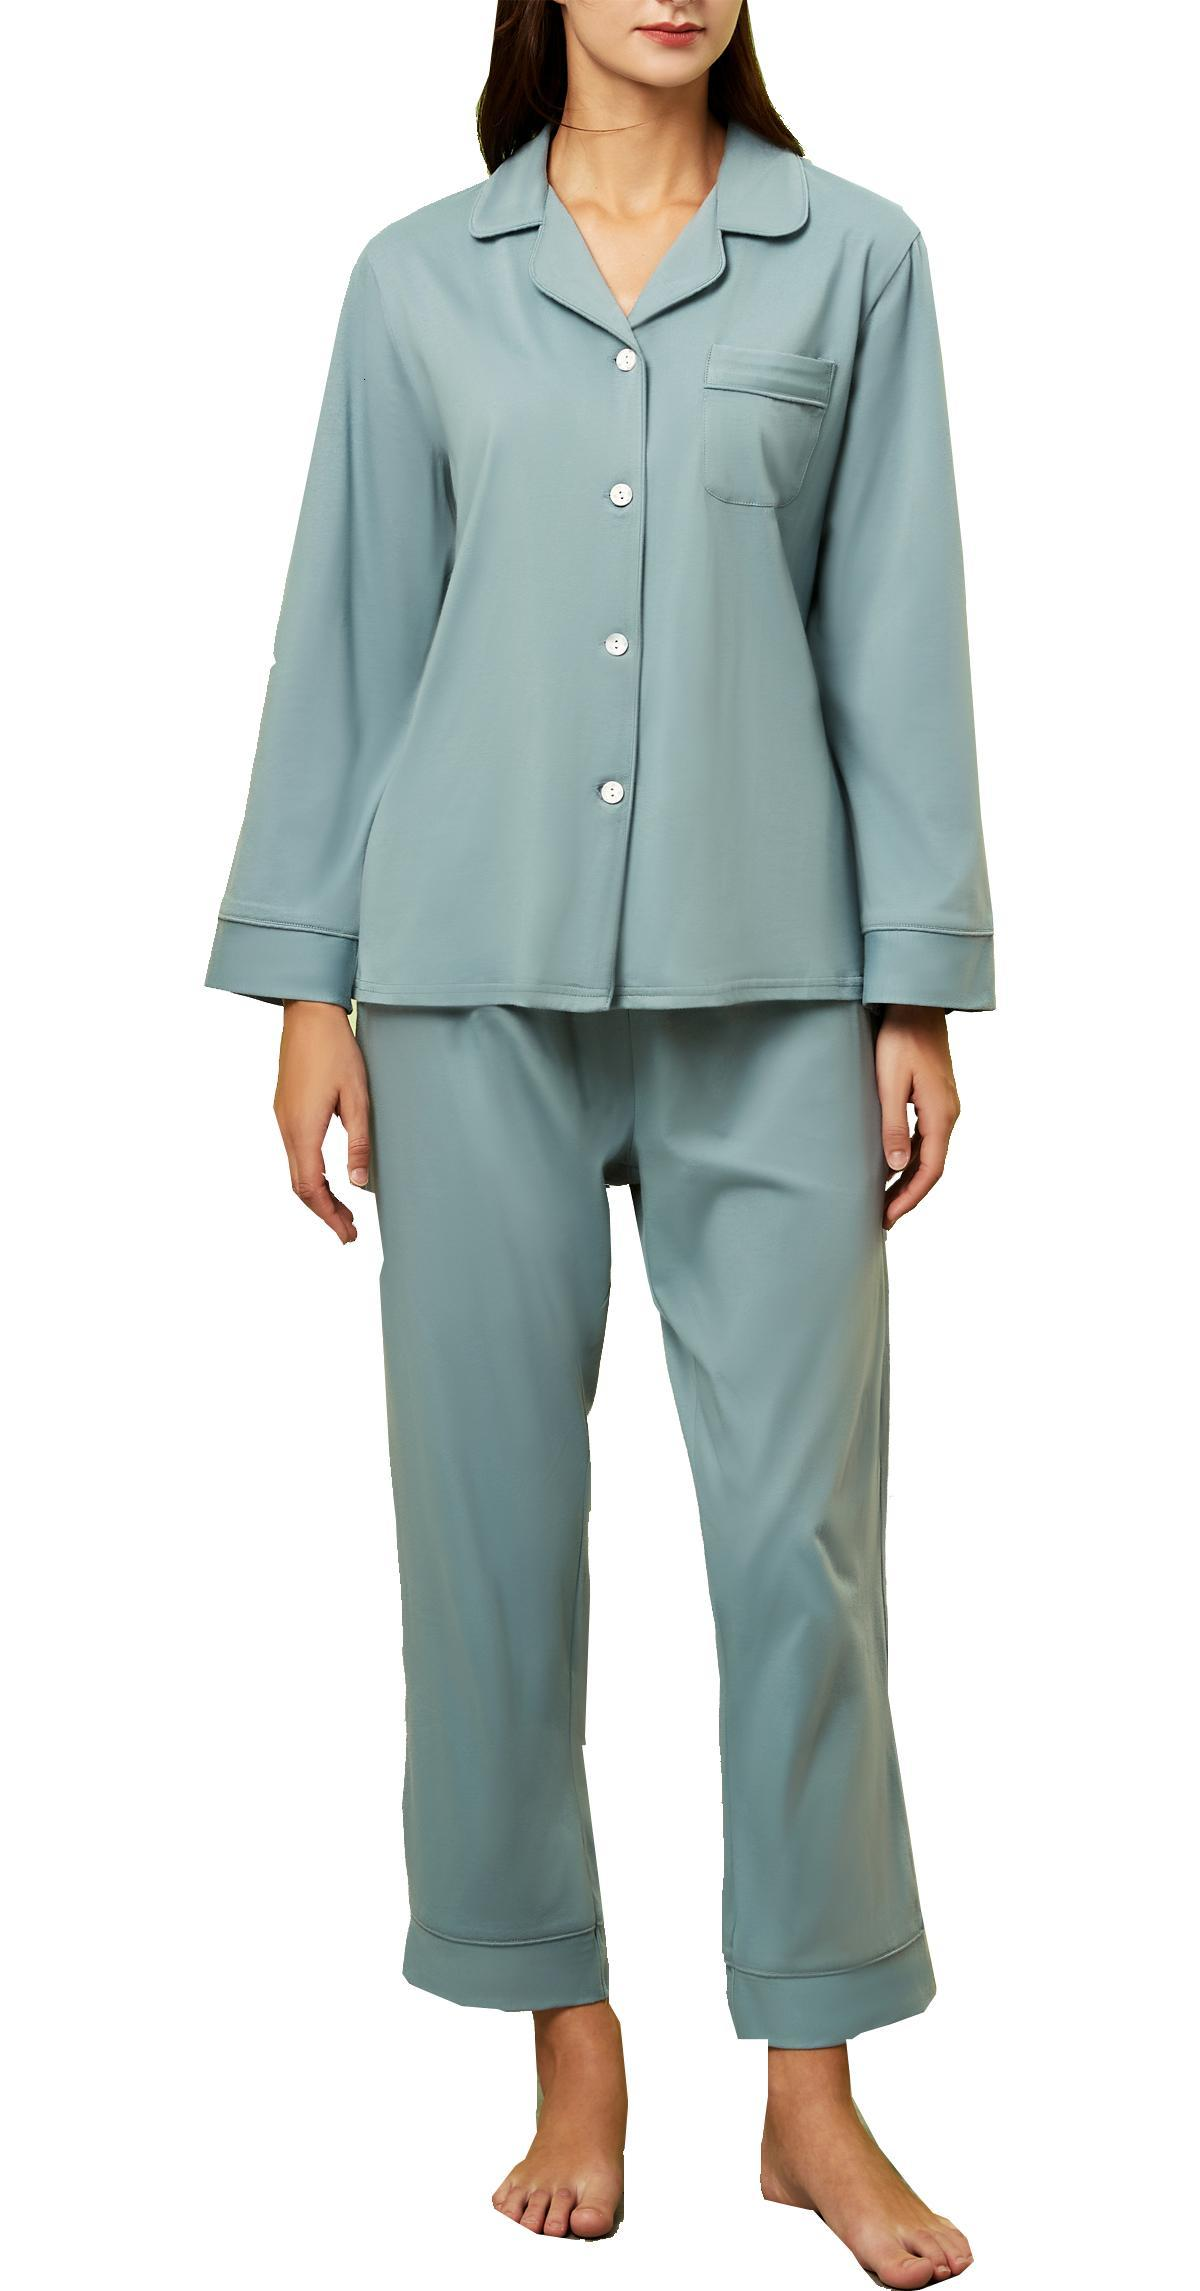 Women Cotton Pajamas Set Classic Long Sleeves Button Down Sleepwear Nightwear Ladies Retro V Neck Loungewear Pjs